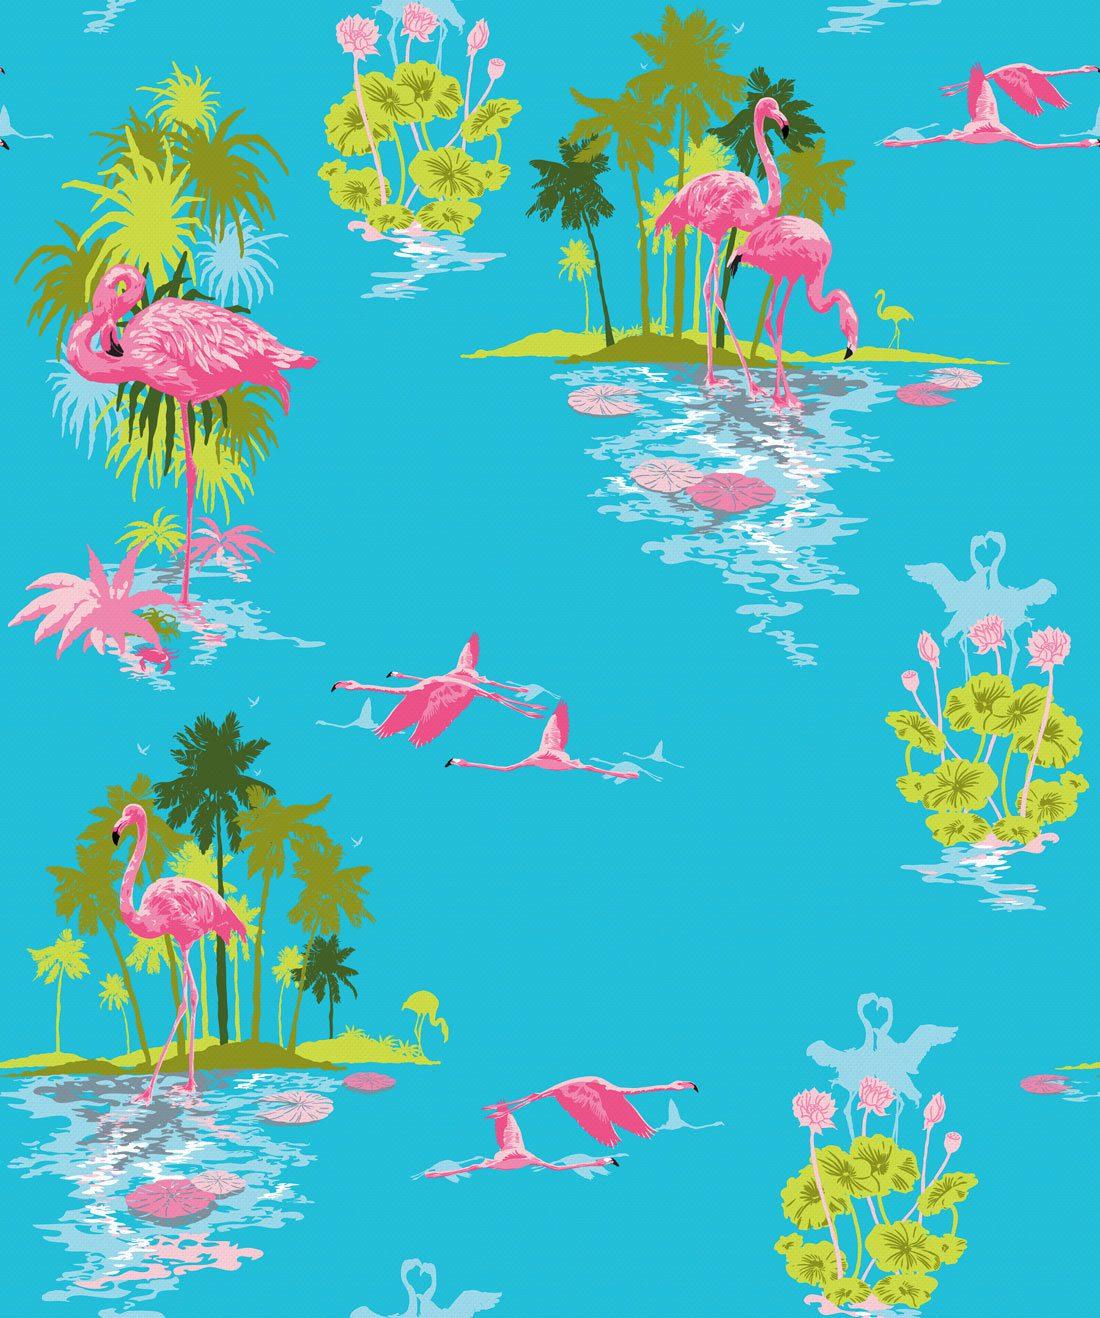 Flamingo Day Wallpaper